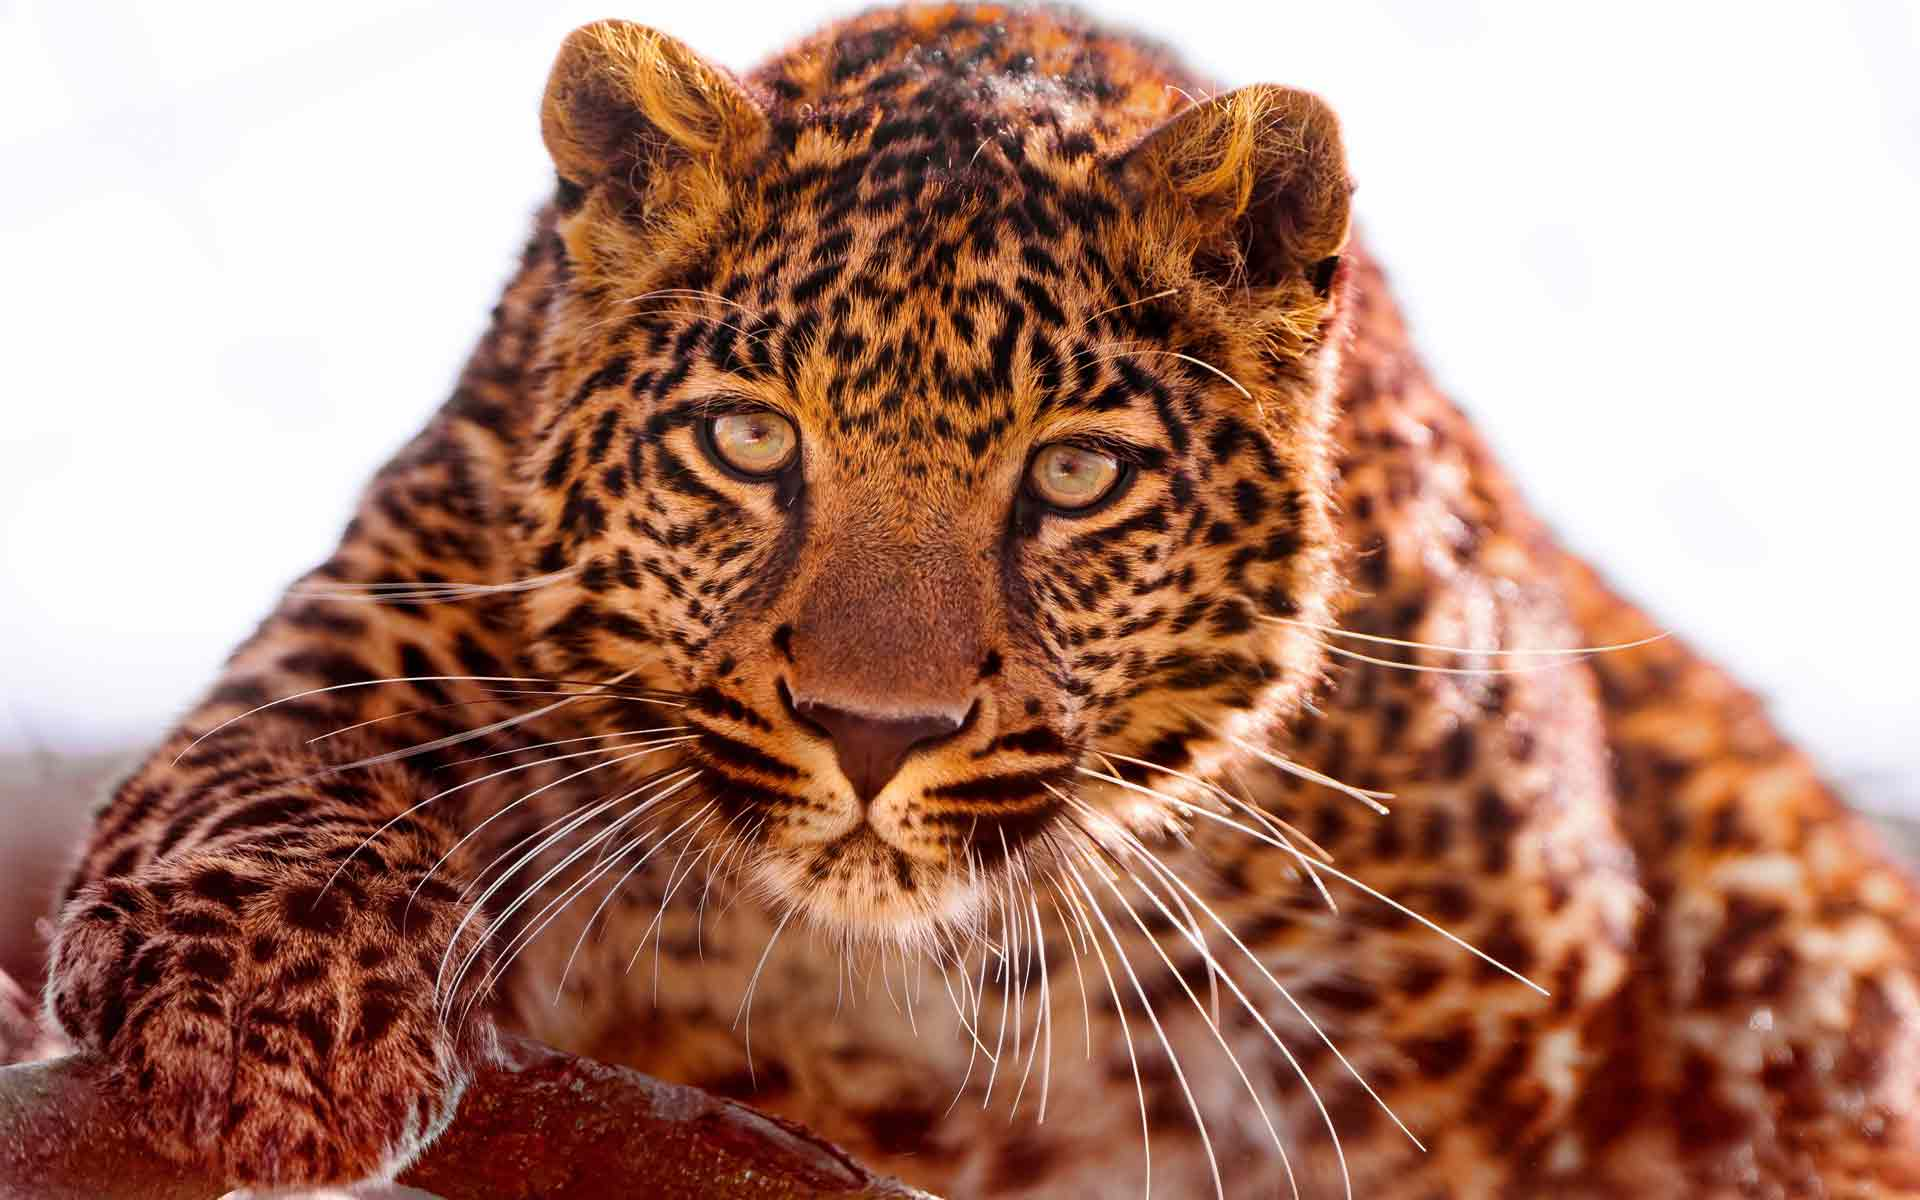 Обои Взгляд агрессии, картинки - Обои на рабочий стол ...  Взгляд Леопарда